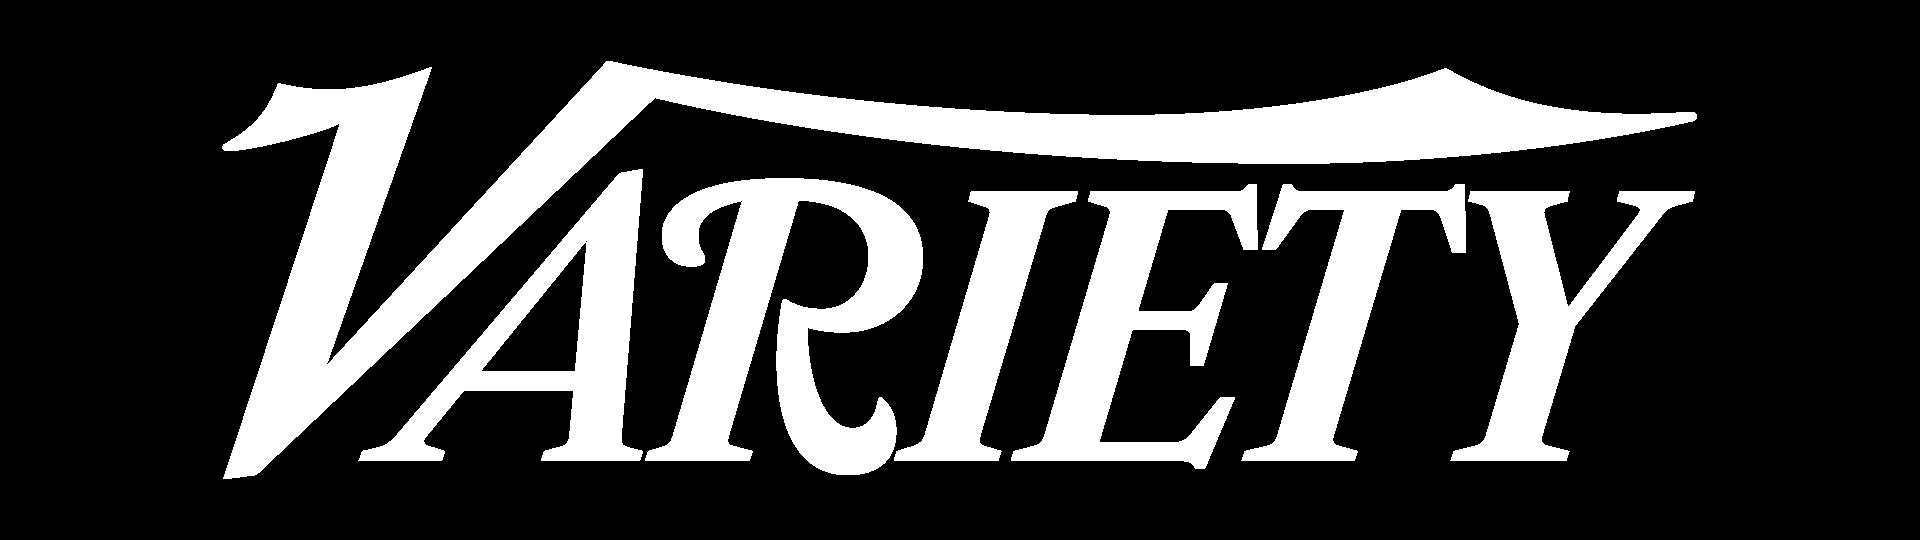 Logo-Variety-White-2.png